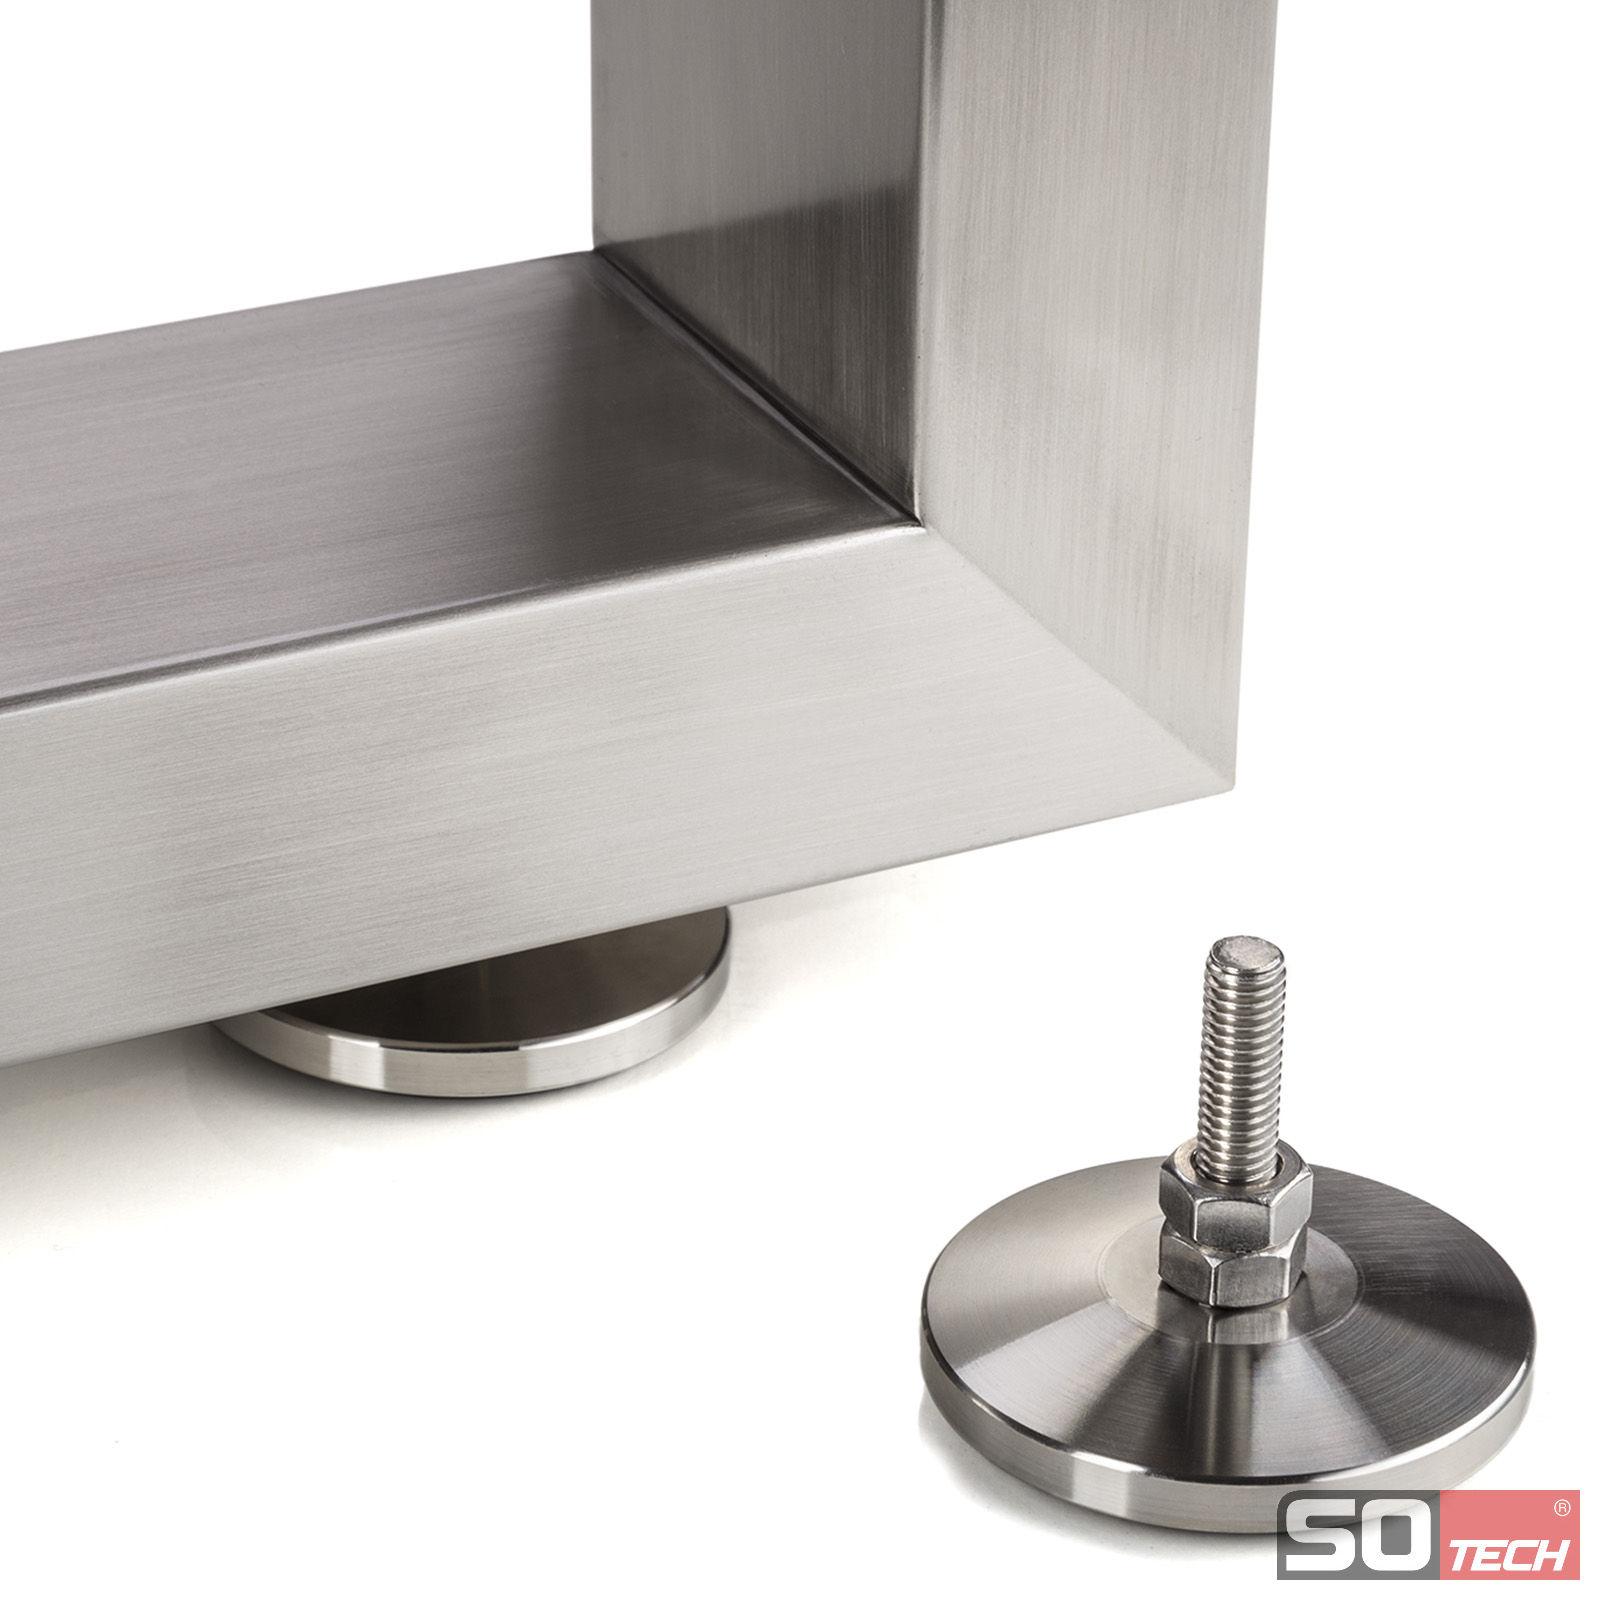 Tischgestell Kufe Echt Edelstahl Höhenverstellbar So Handelde